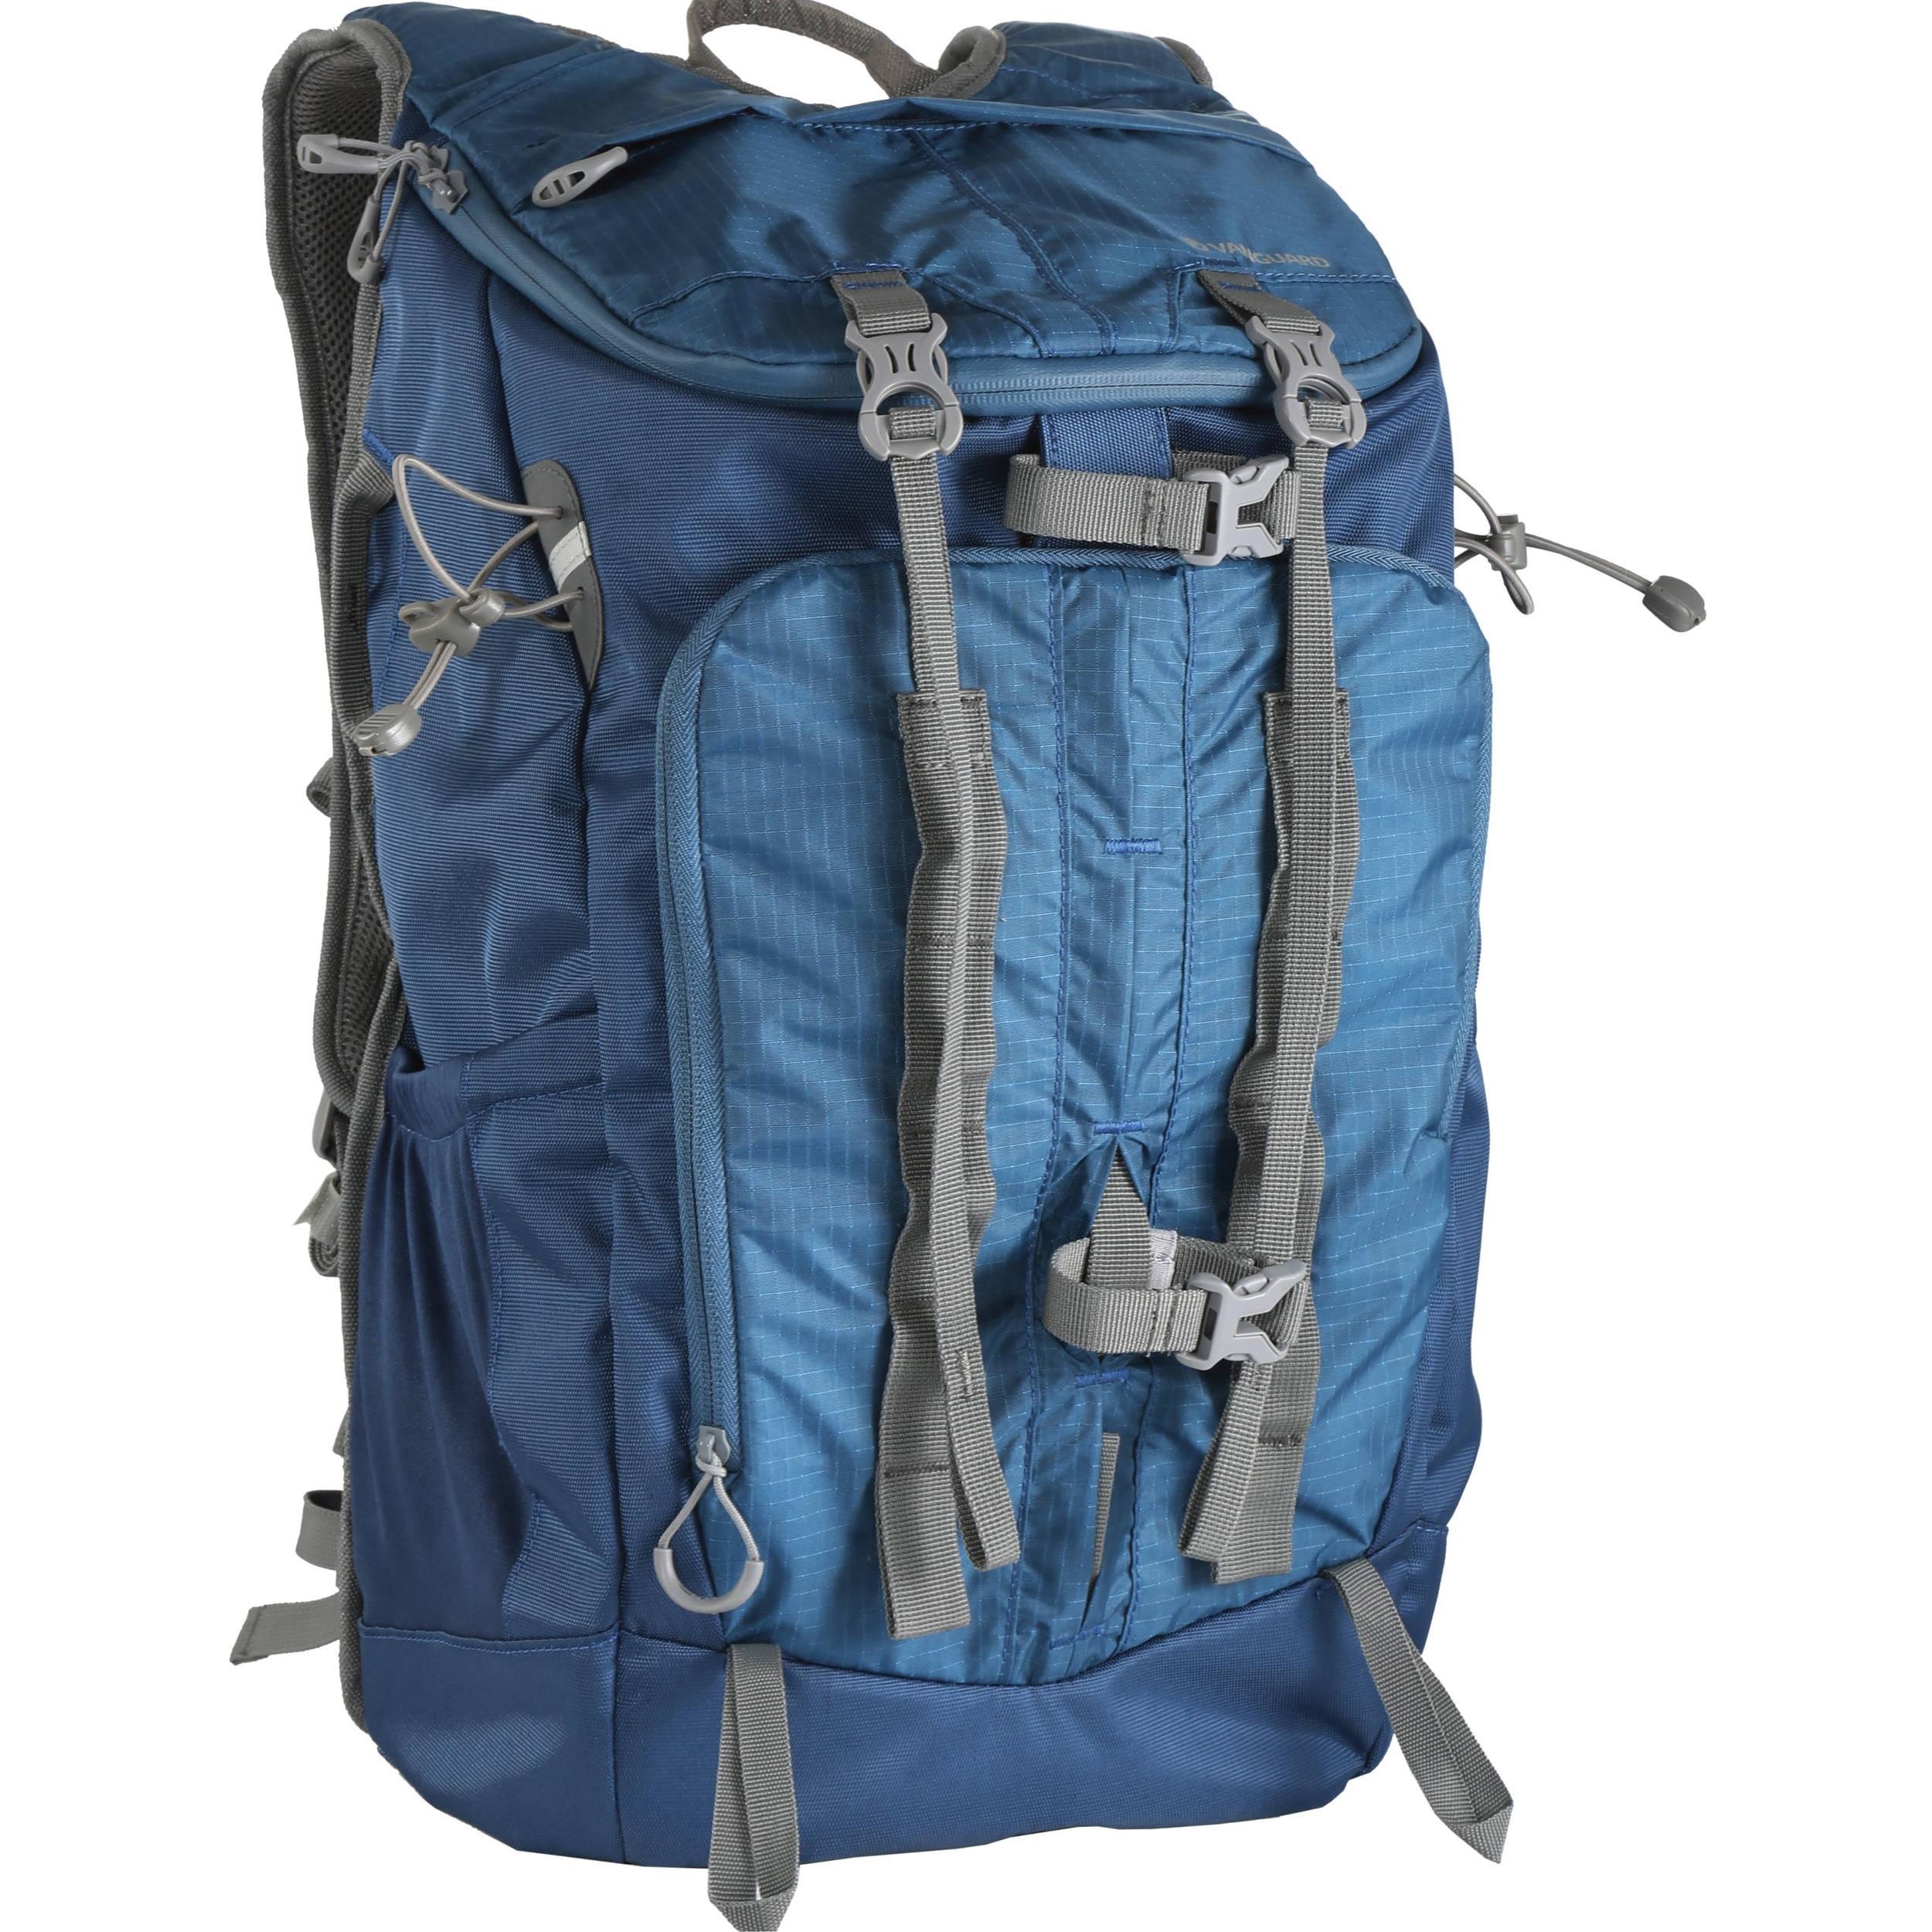 Vanguard Sedona 51 DSLR Backpack (Blue) SEDONA 51BL B&H Photo